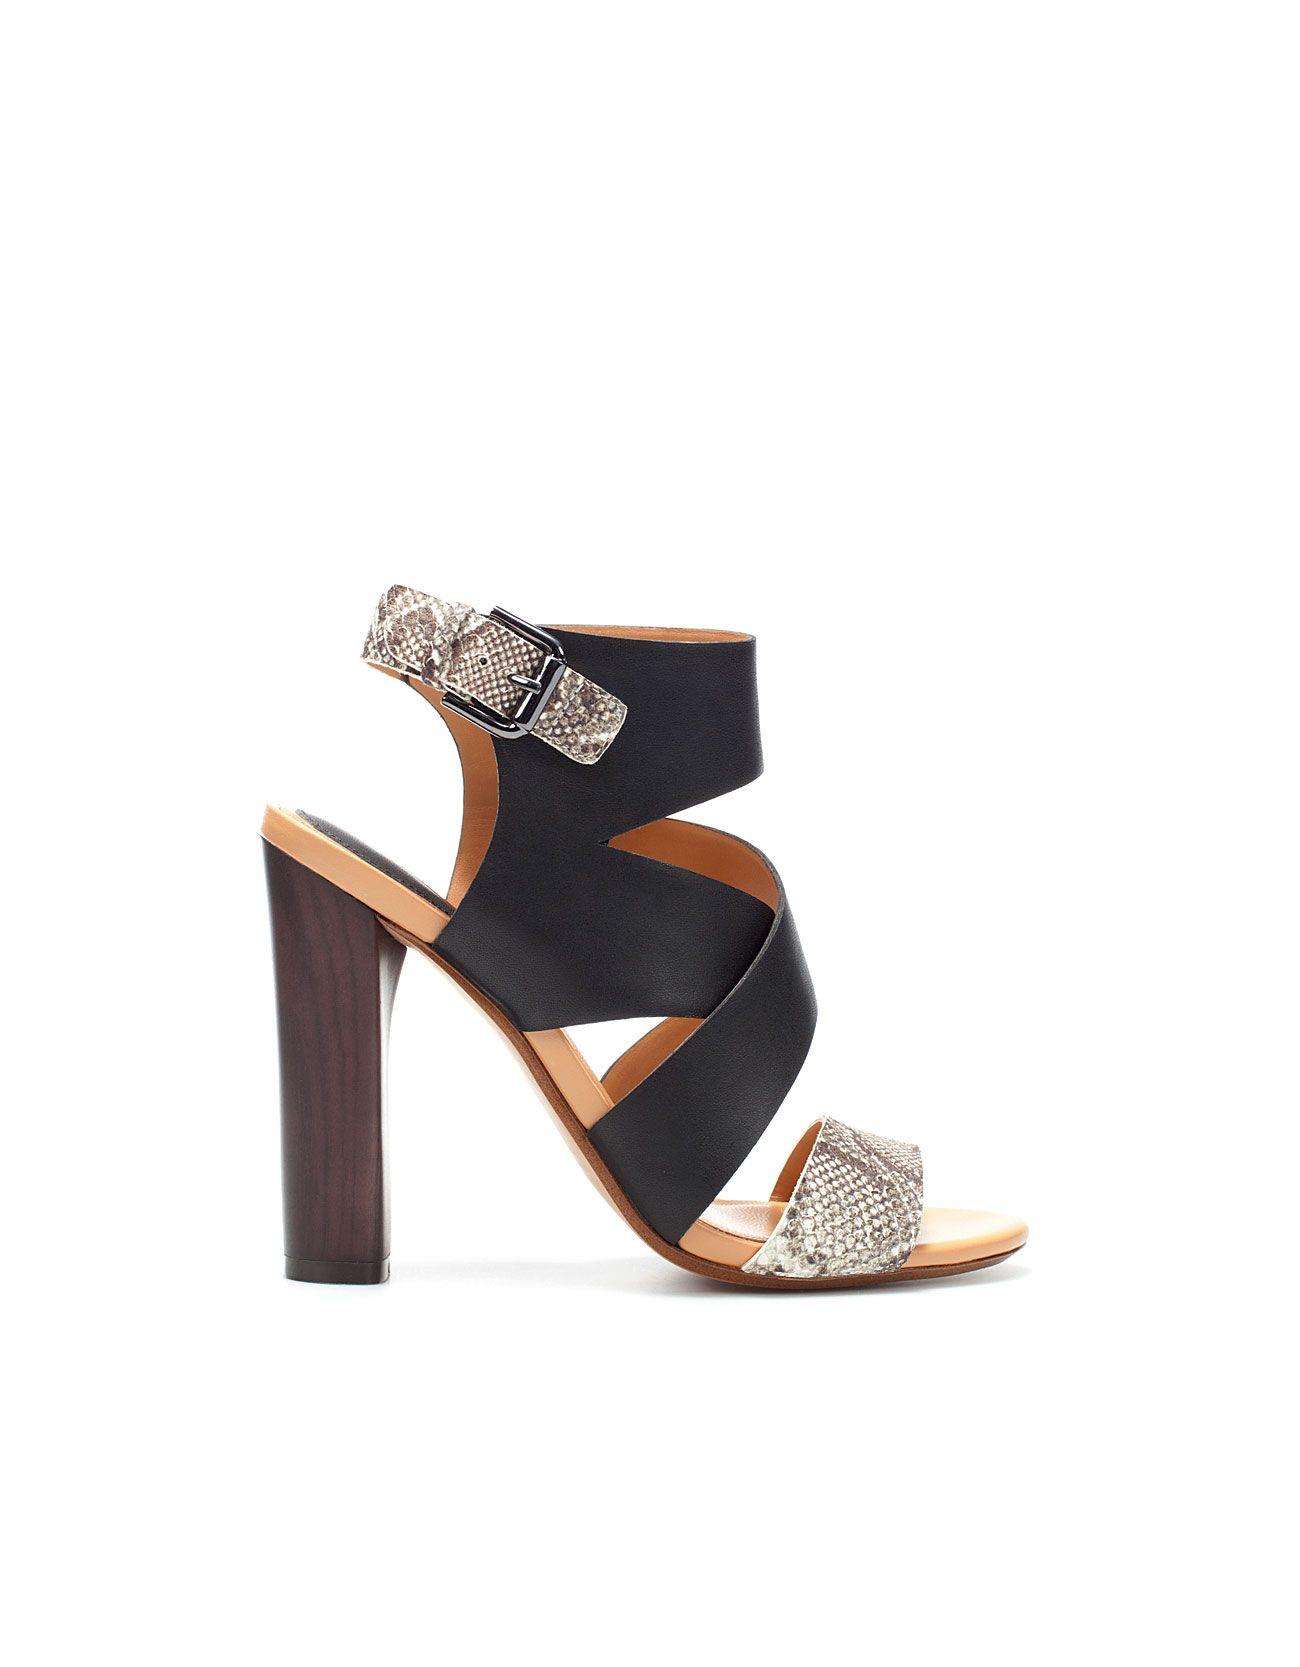 91af3feb0c37 3 4 12 Zara snake skin straps heeled sandals. On this day in 1974 ...